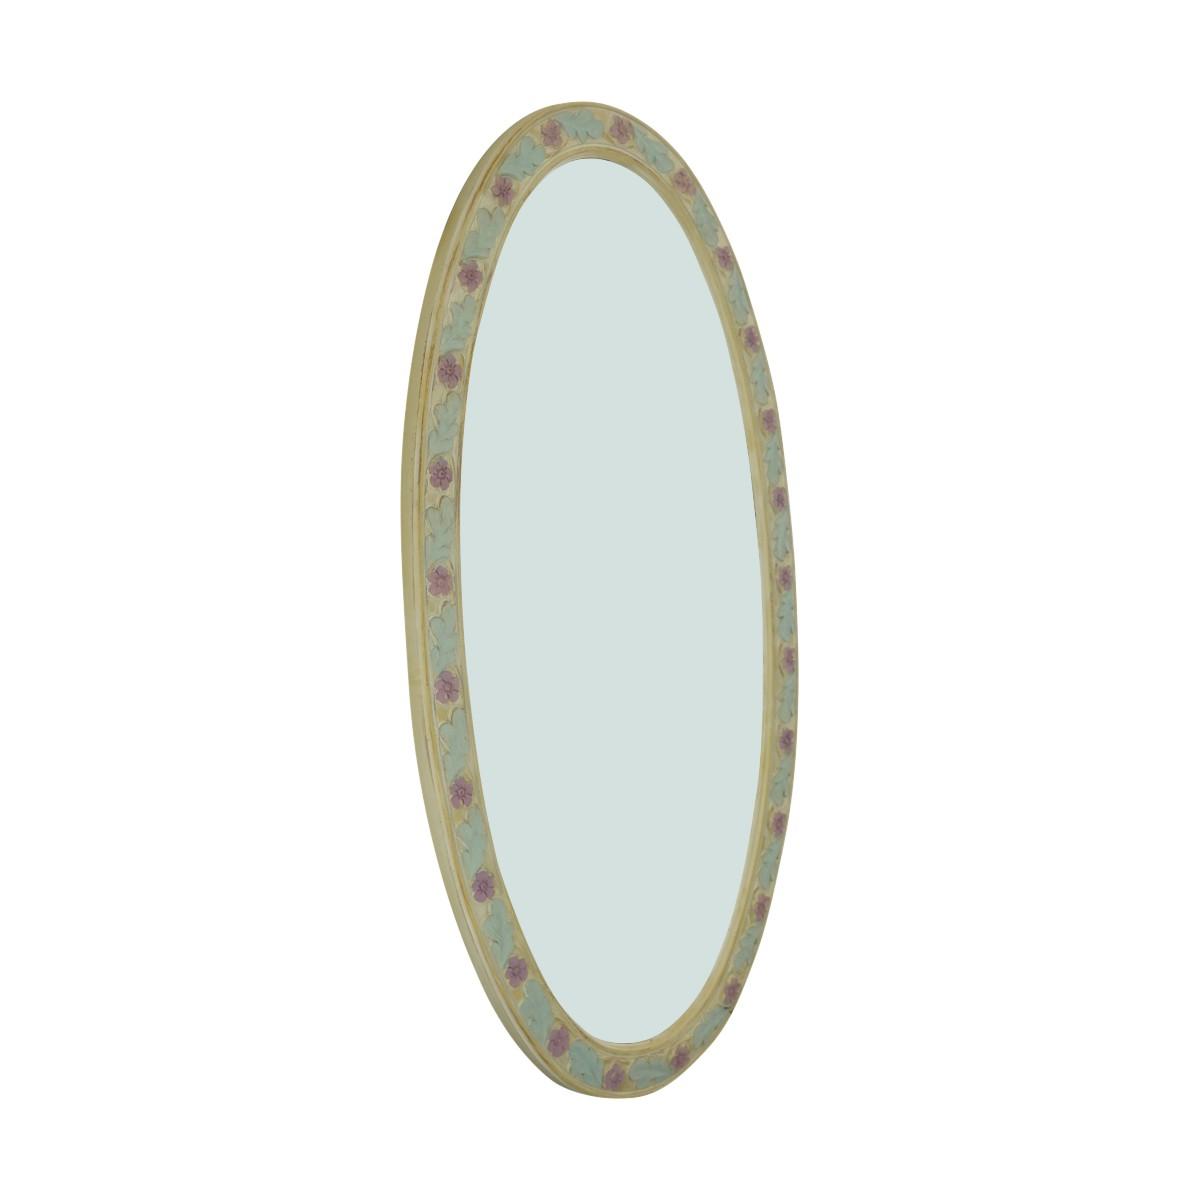 Victorian Vanity Mirror Oval Poly Flower Frame Oval Mirror Victorian Vanity Mirror Flower Frame Mirror